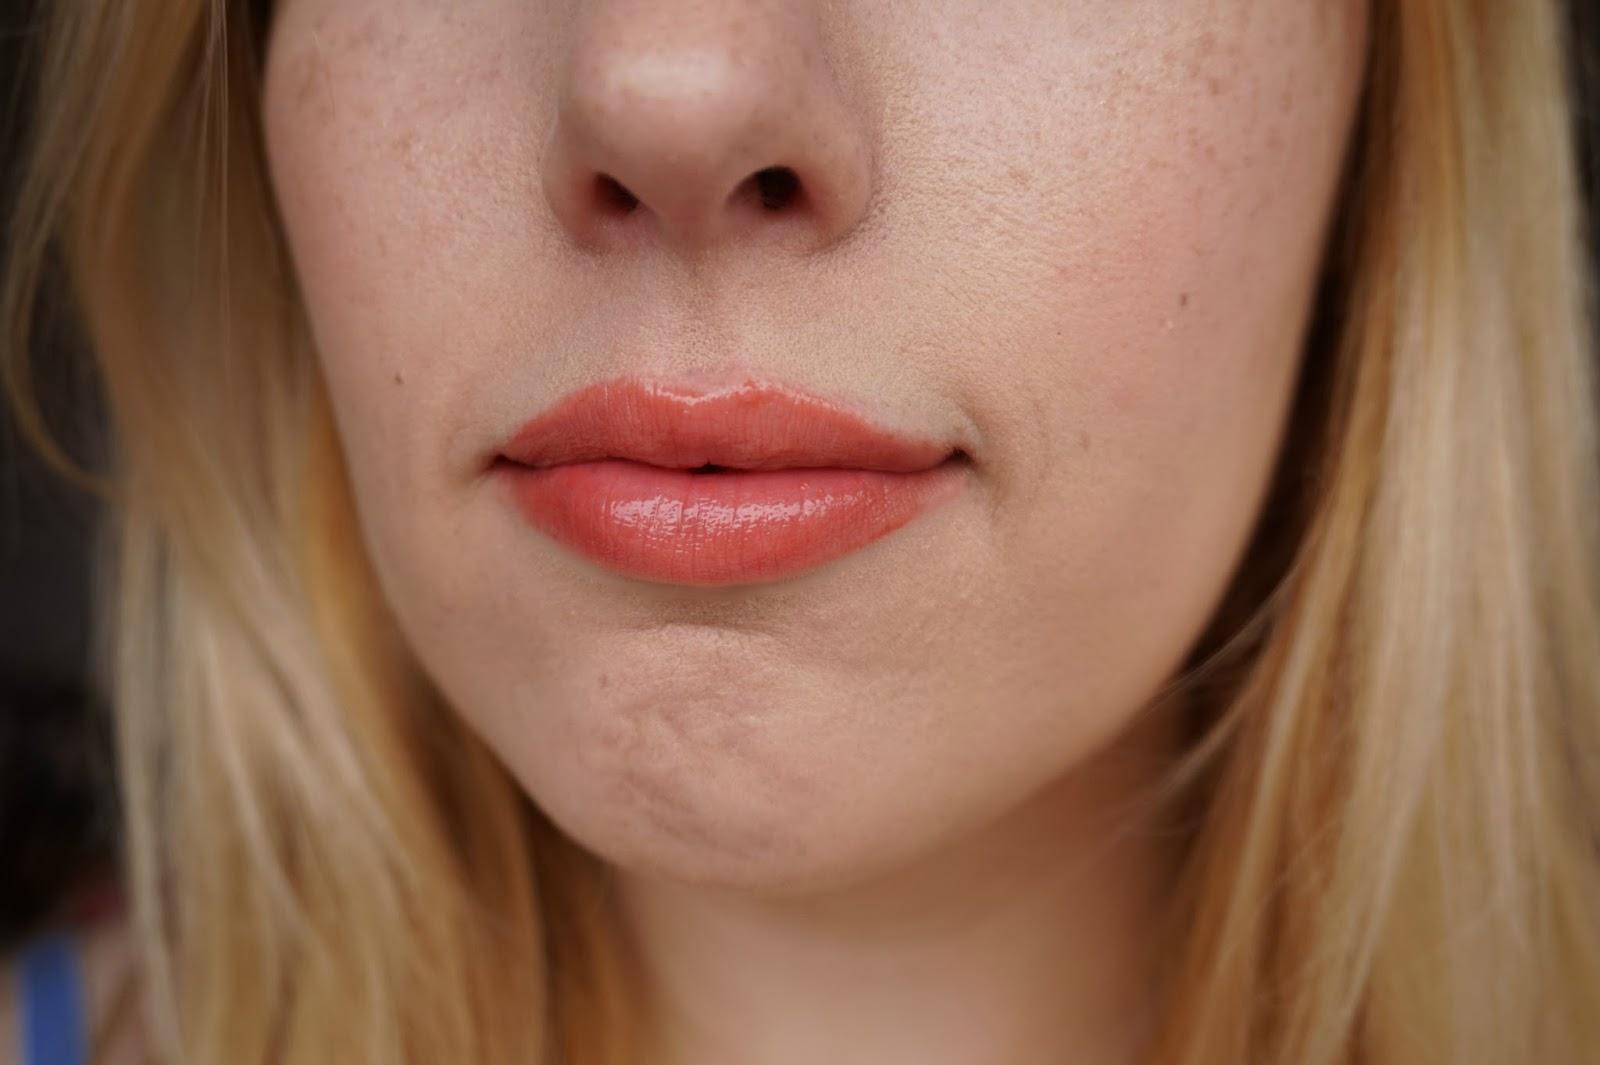 Dior Addict Milky Tint 356 Milky Peach lip swatch